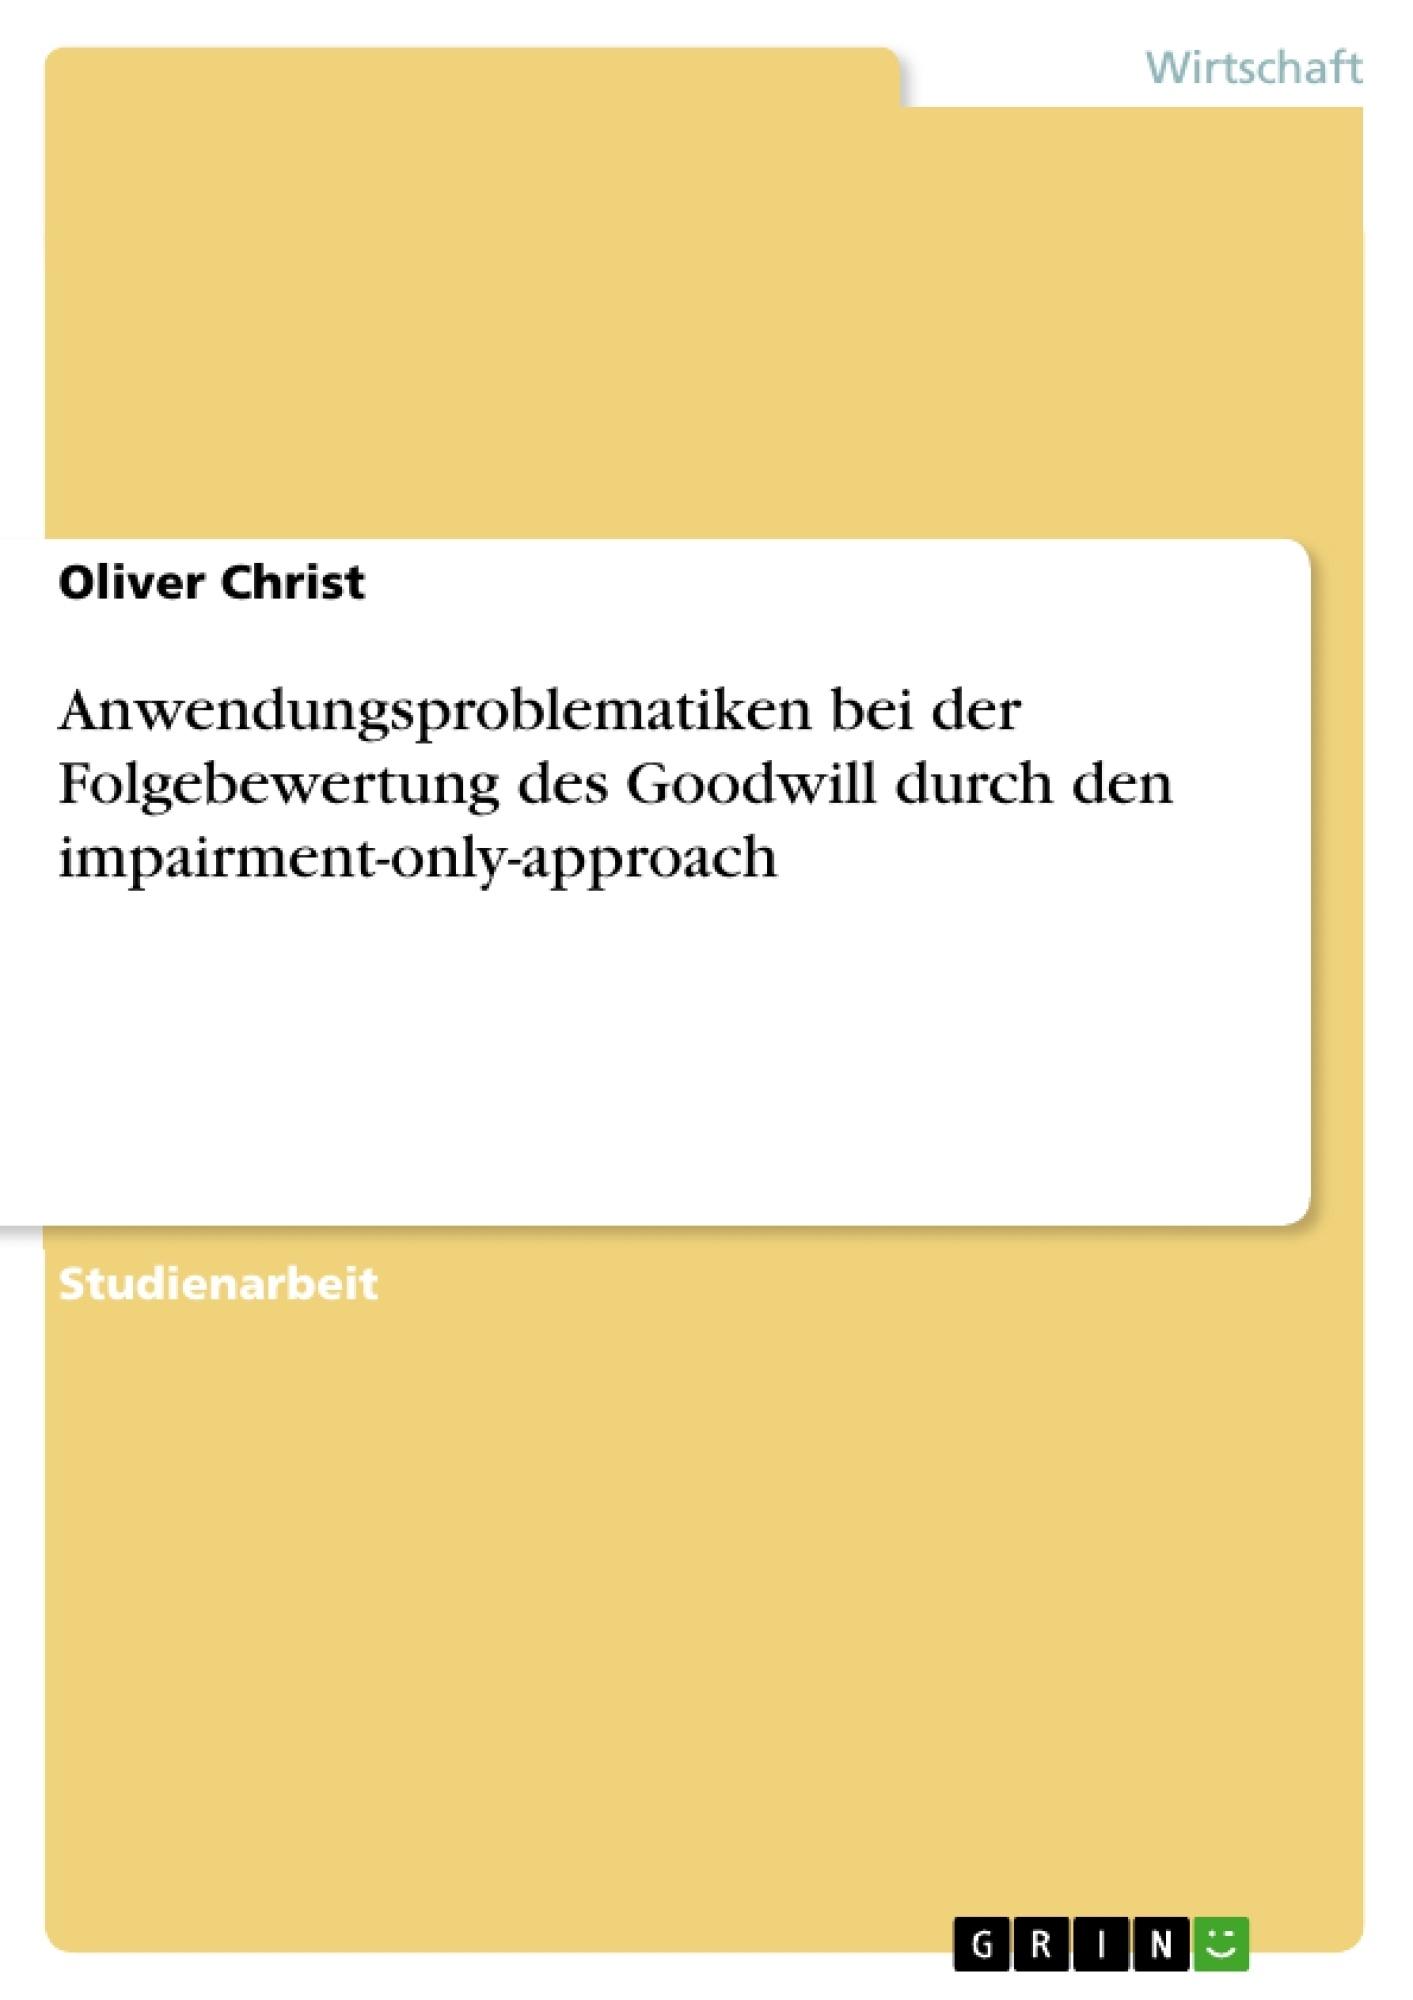 Titel: Anwendungsproblematiken bei der Folgebewertung des Goodwill durch den impairment-only-approach